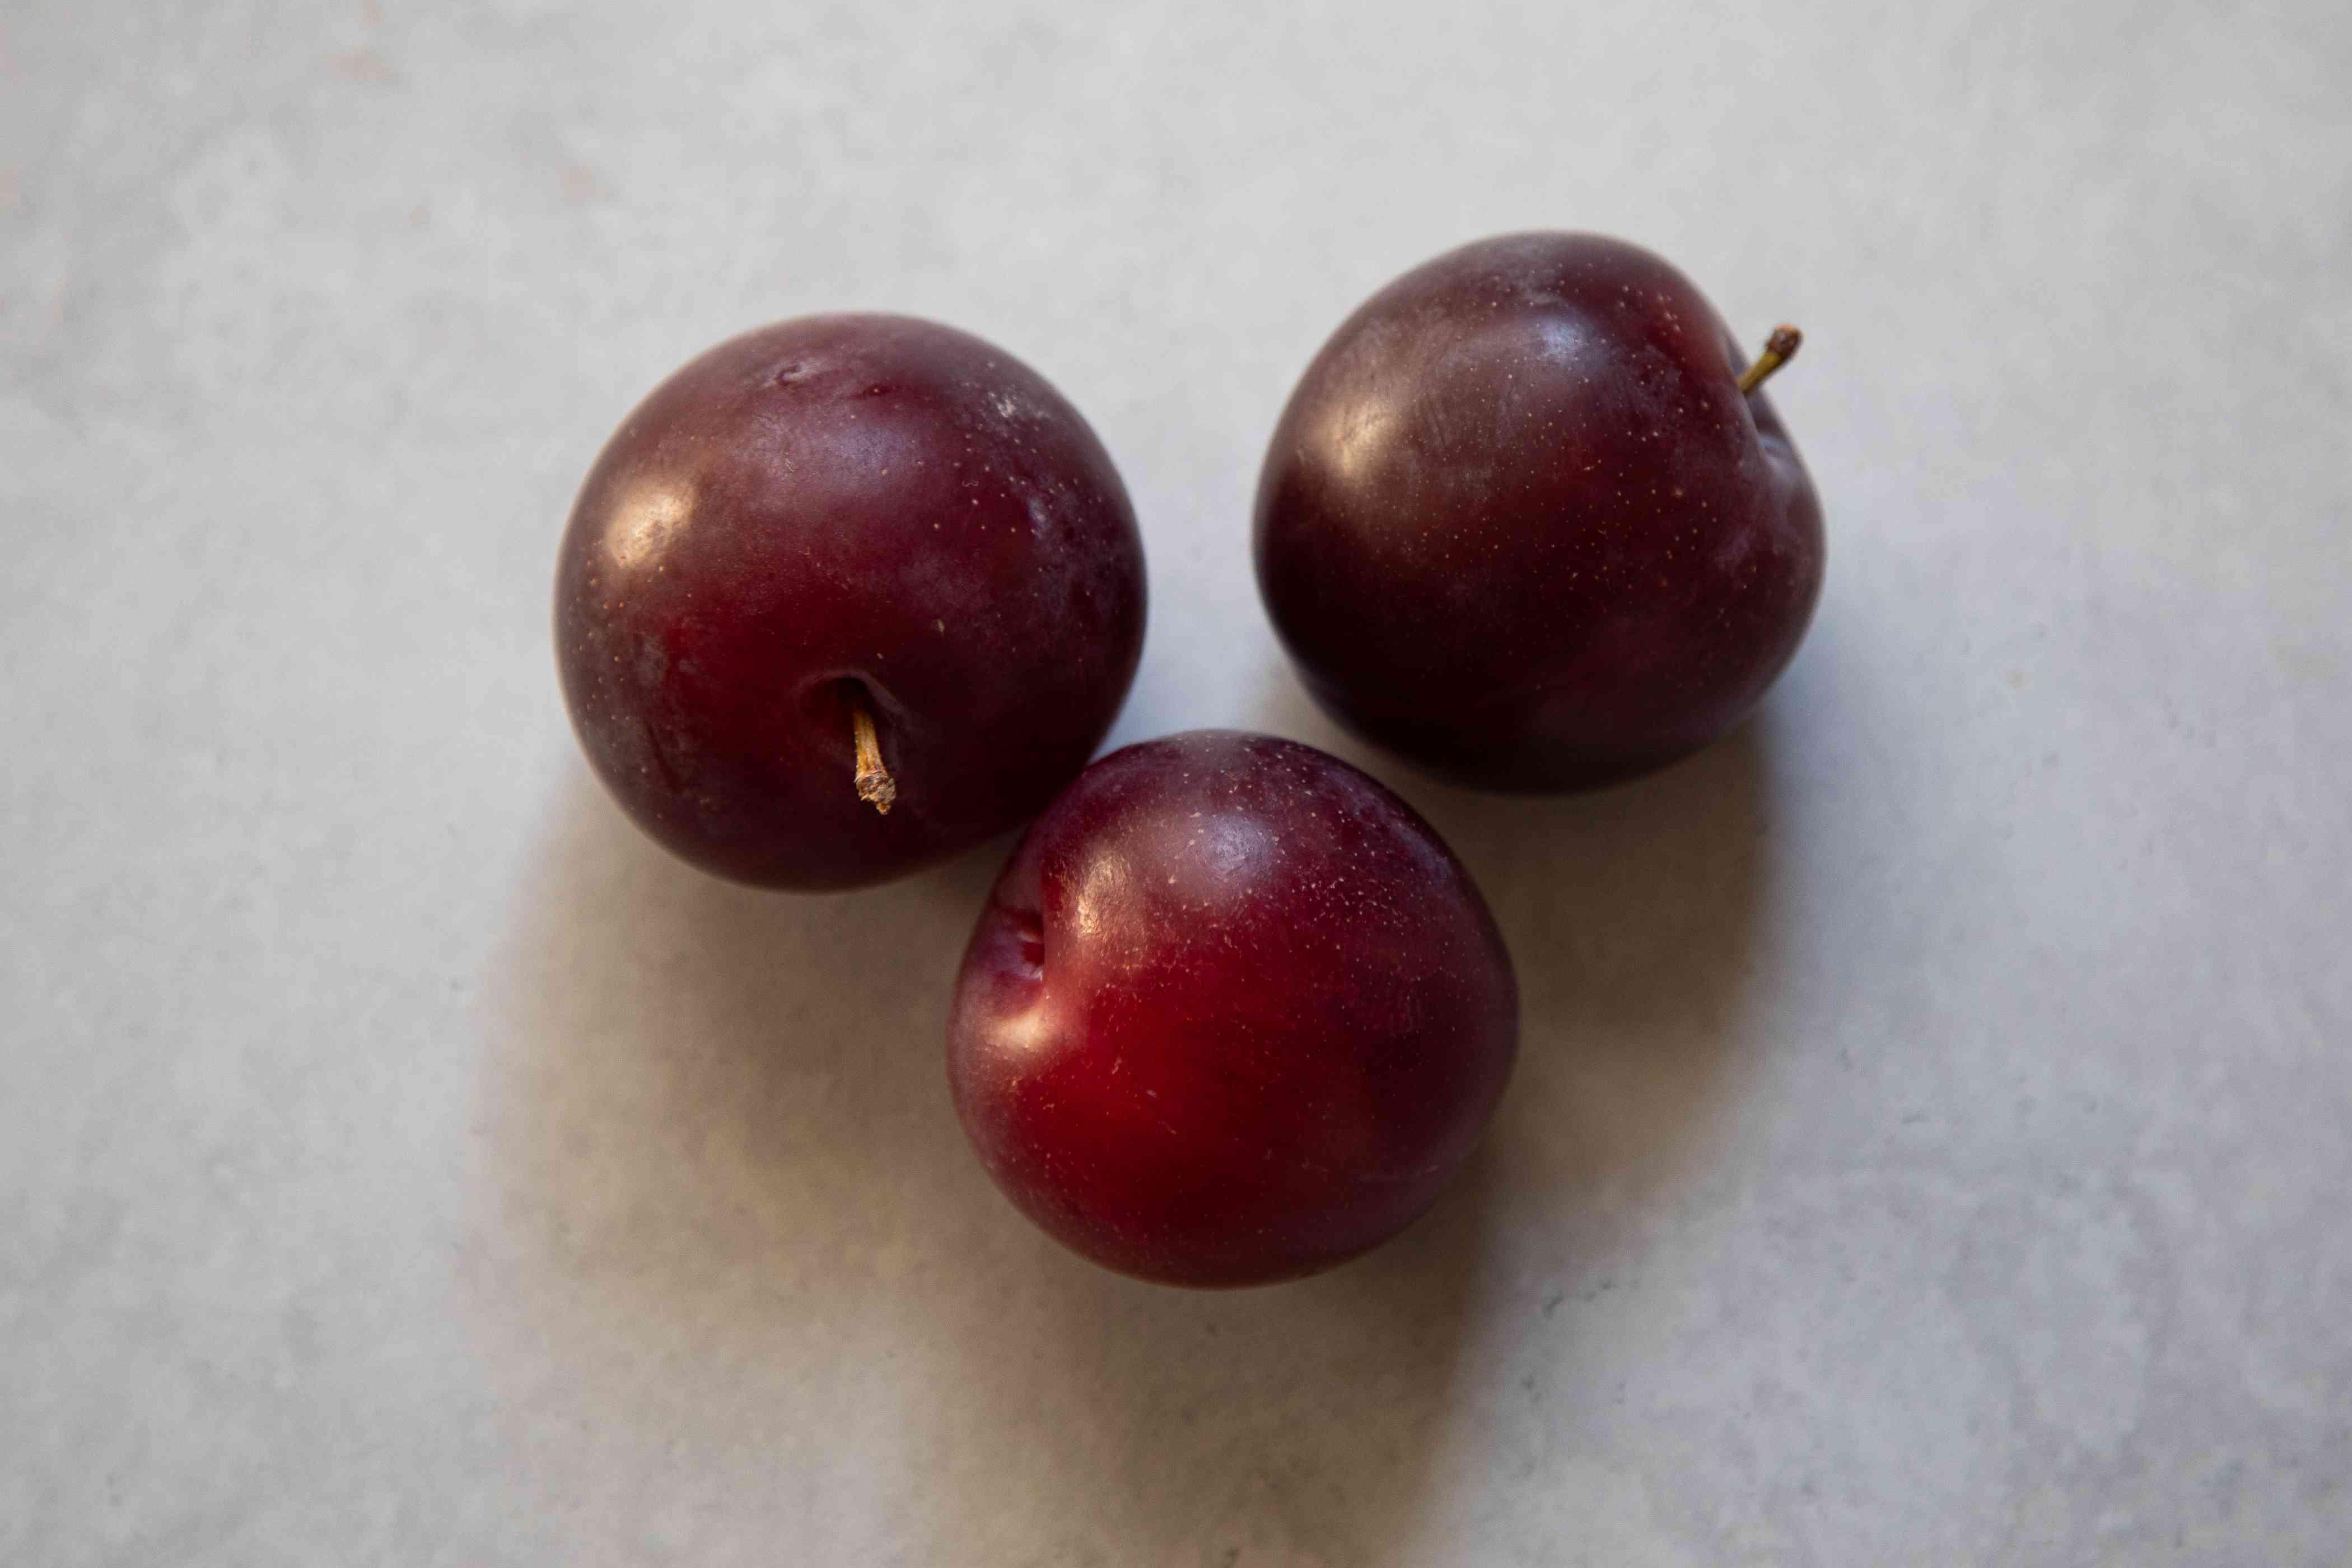 Three purple plums